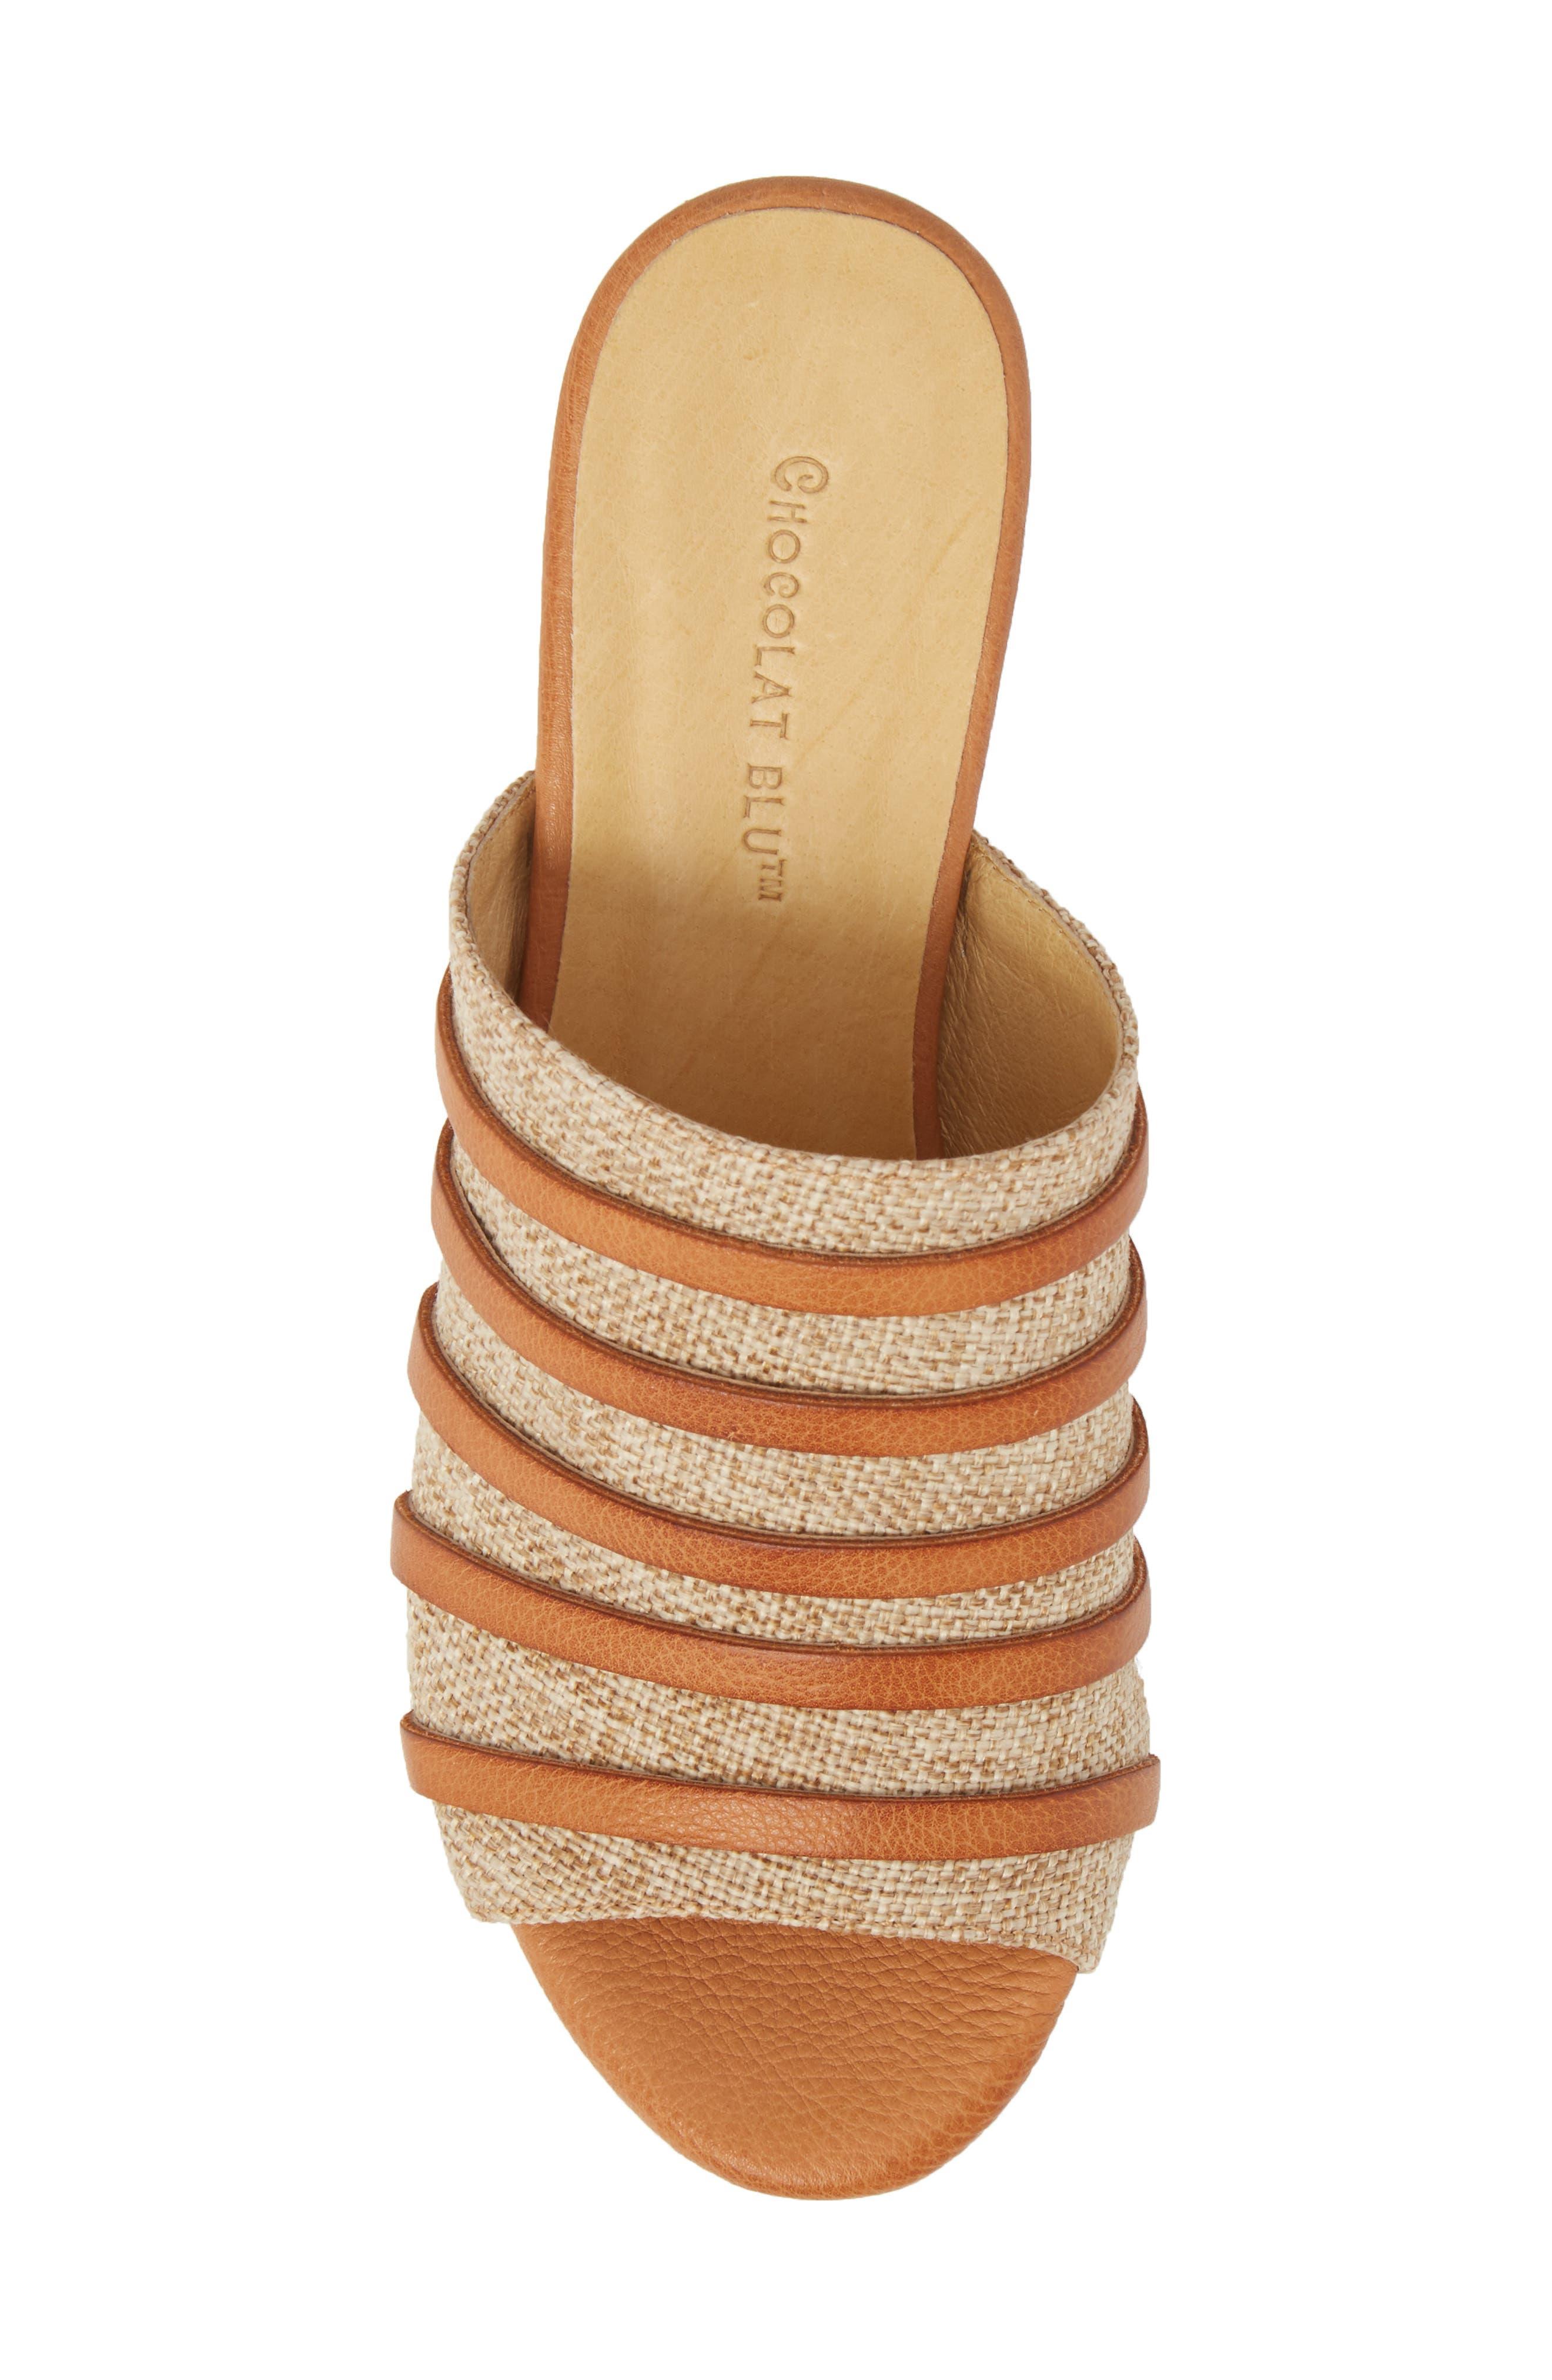 Wapi Wedge Sandal,                             Alternate thumbnail 5, color,                             Camel Leather